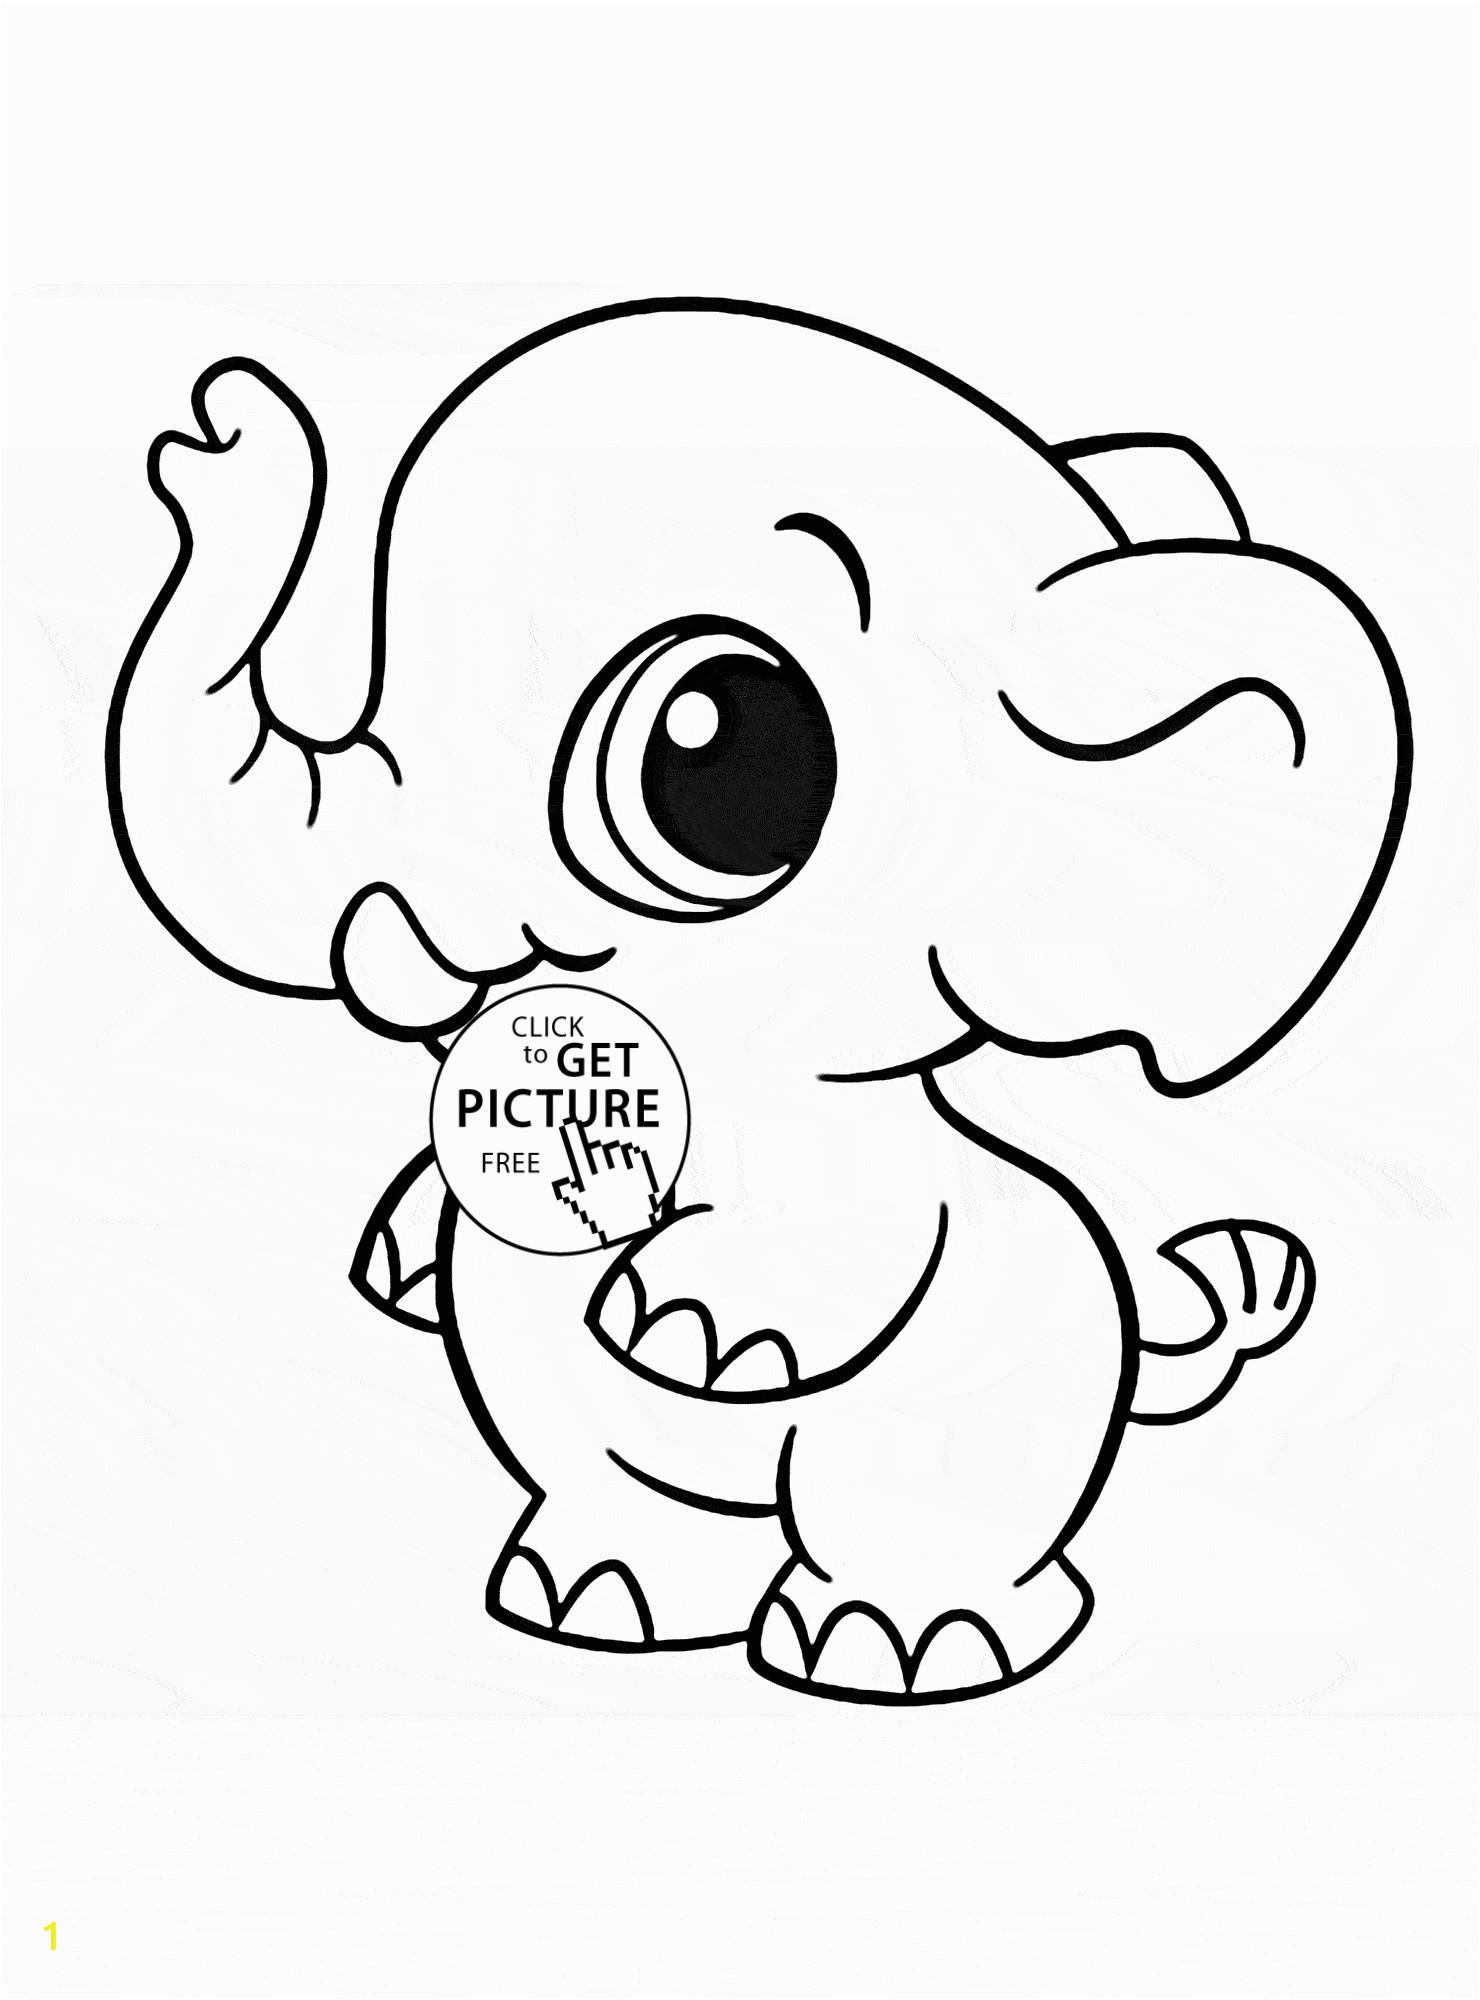 elephant cartoon coloring beautiful funny animals coloring page cute dog coloring pages of elephant cartoon coloring